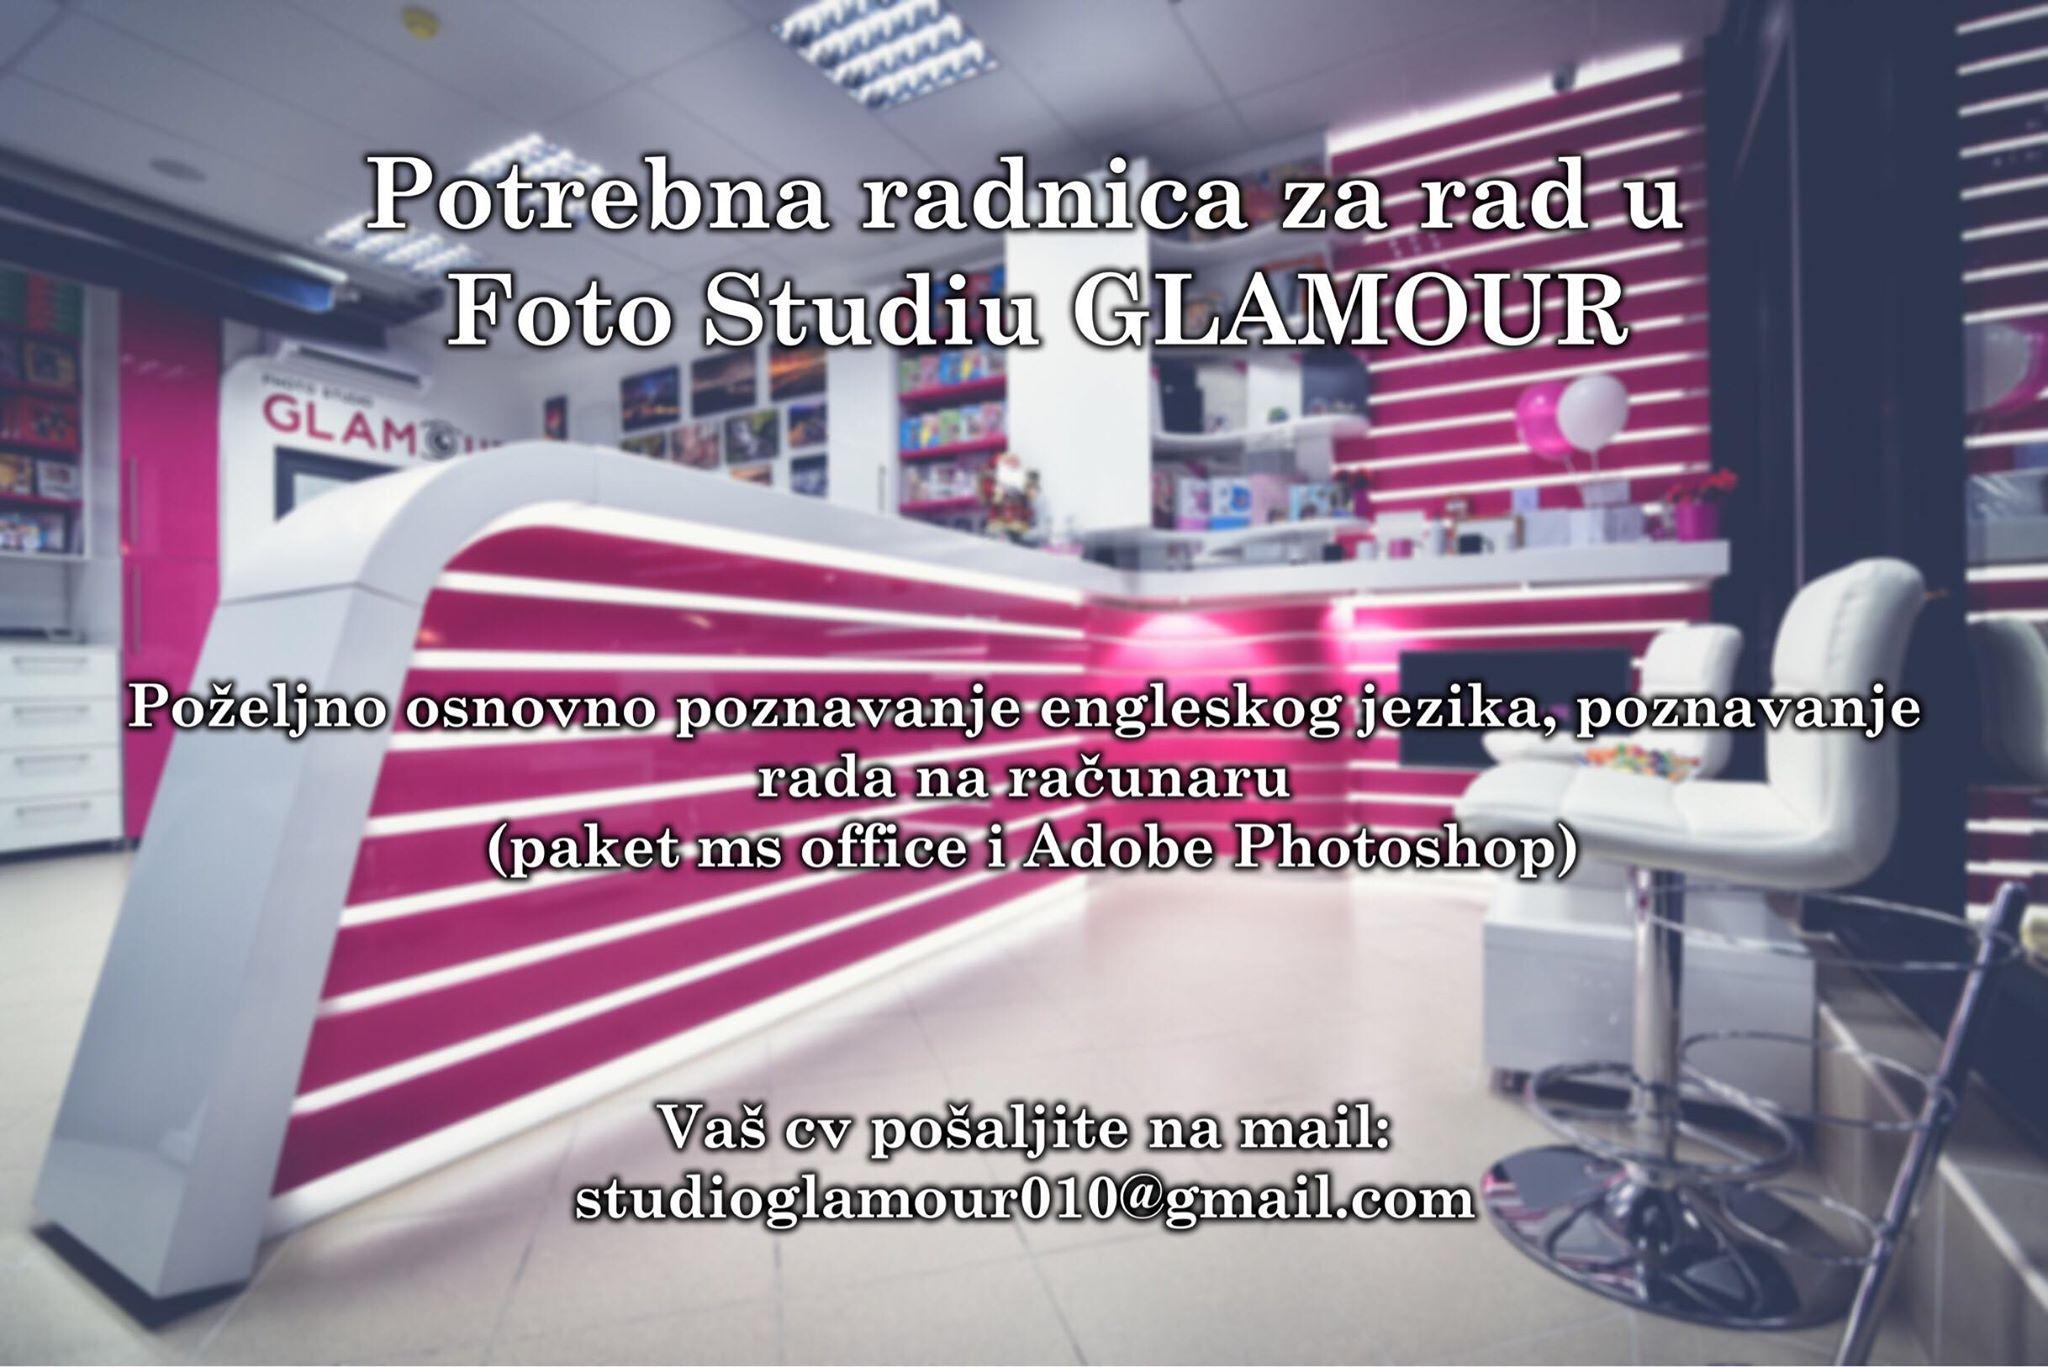 Photo of POSAO: Foto studiu Glamour potrebna radnica